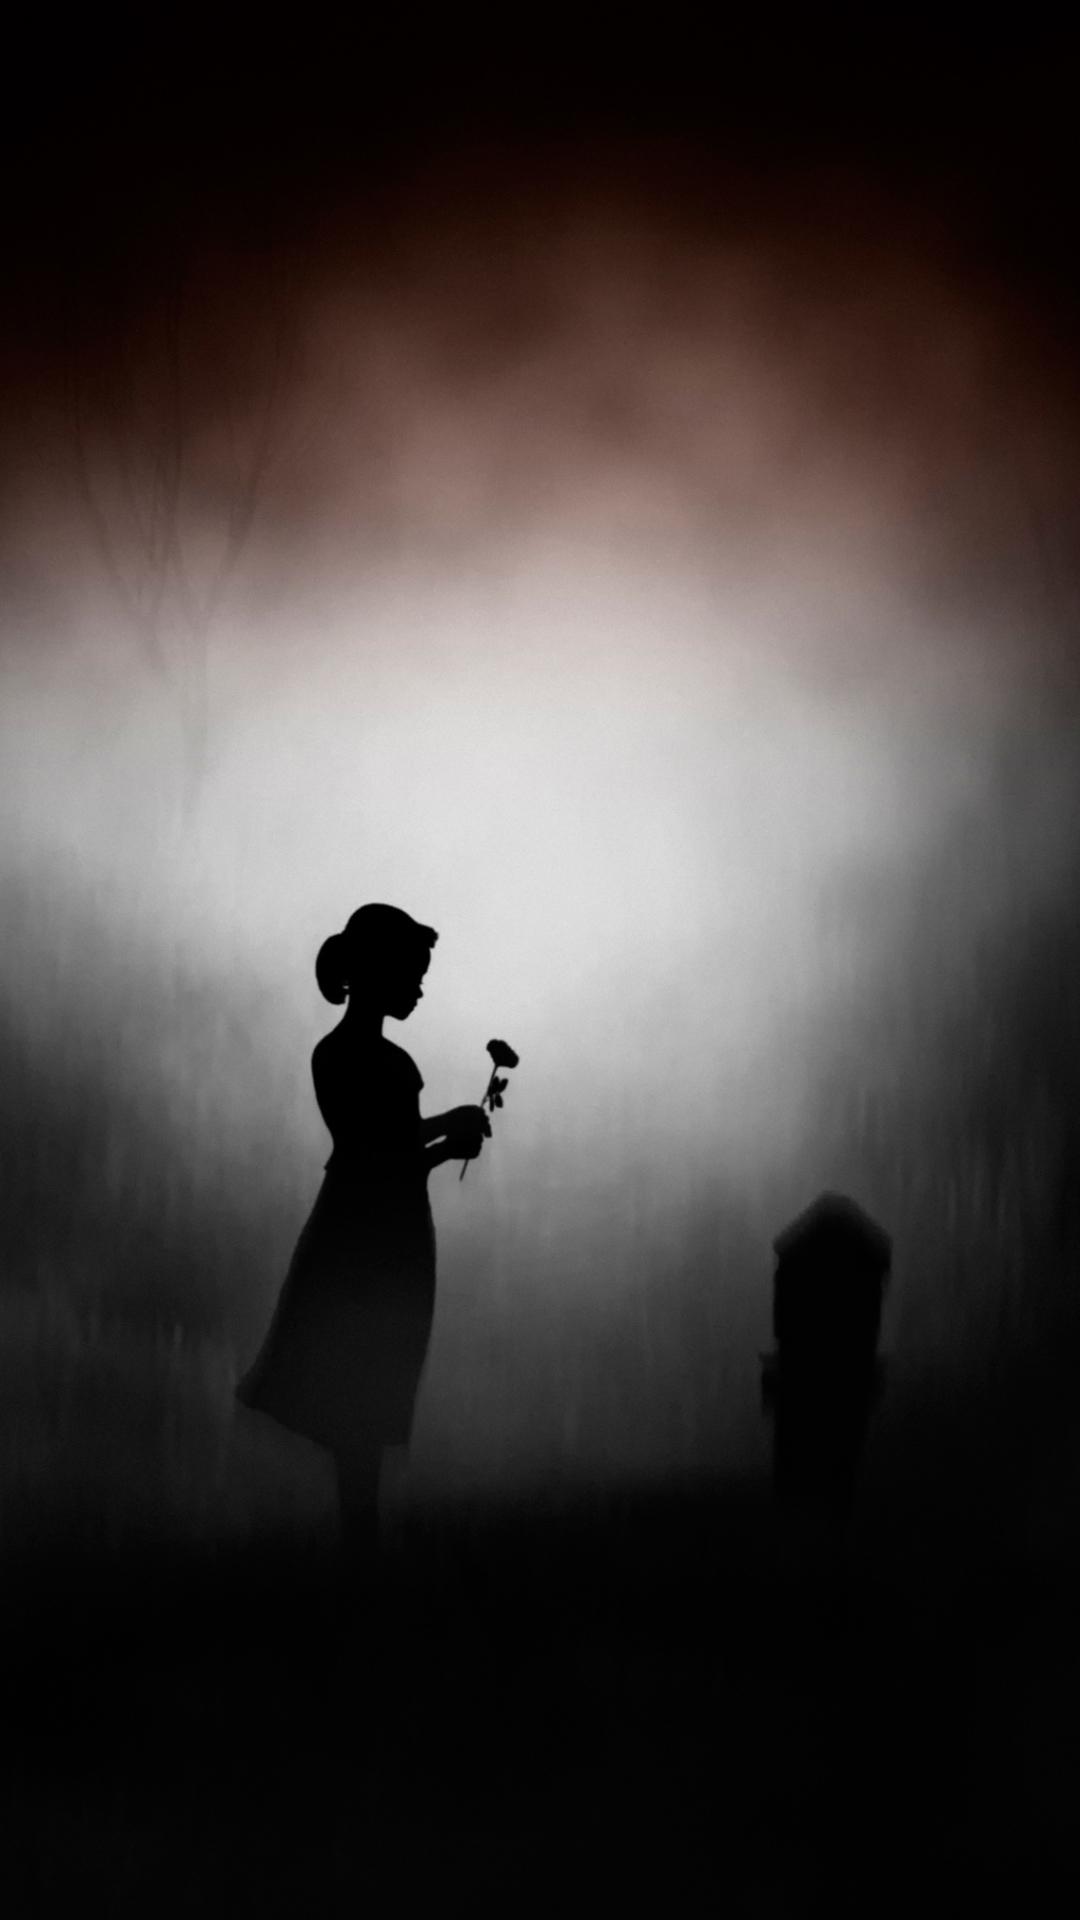 Dark Girl 1080x1920 Wallpaper Id 710162 Mobile Abyss